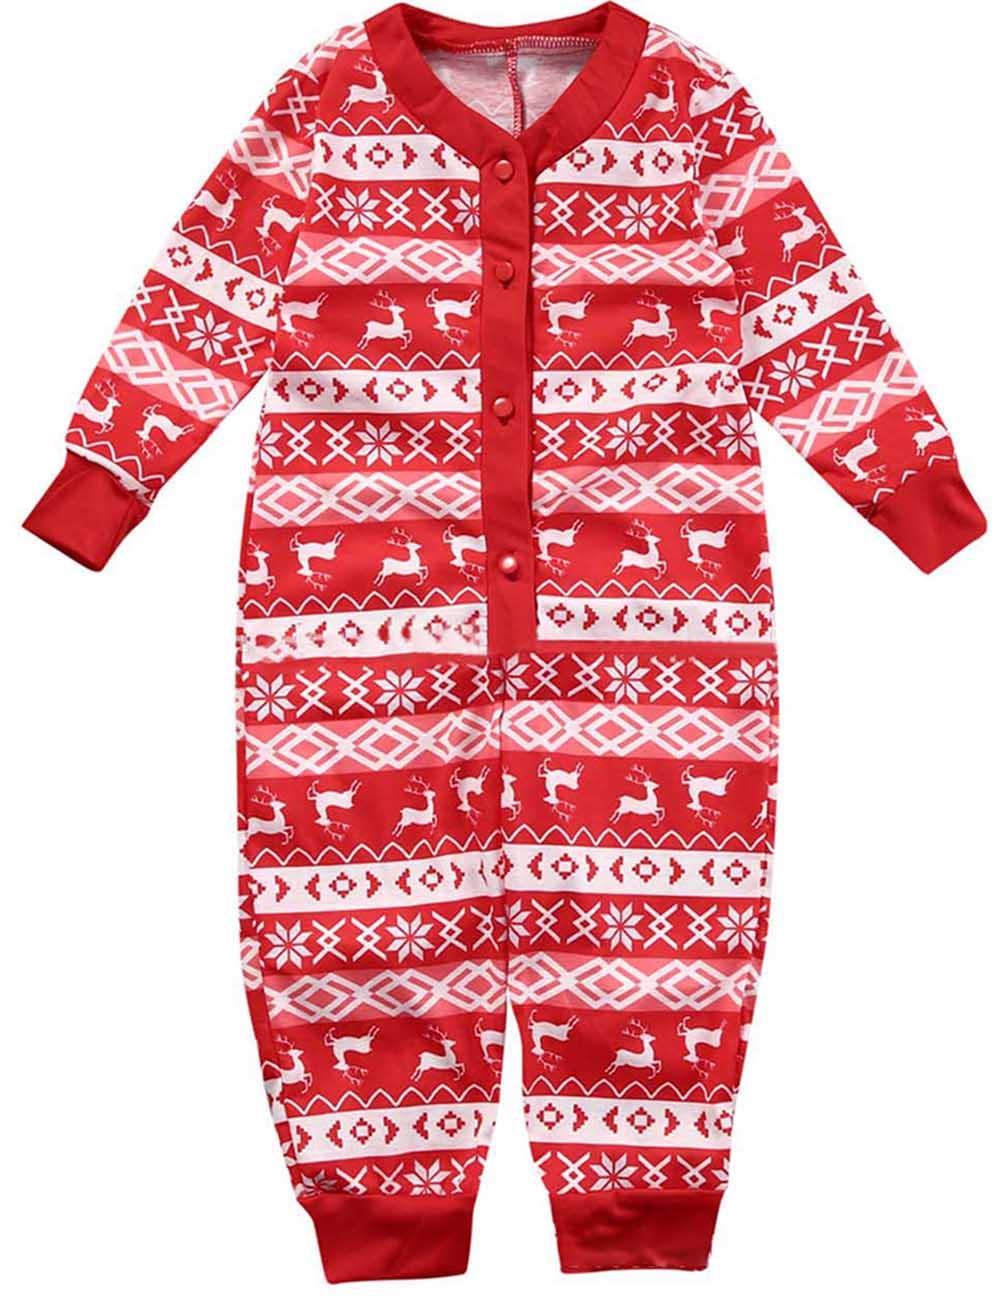 2018 New Christmas Pajamas Set Women Men Baby Kids Family Plaid Pyjamas Kids Photography Clothes Set